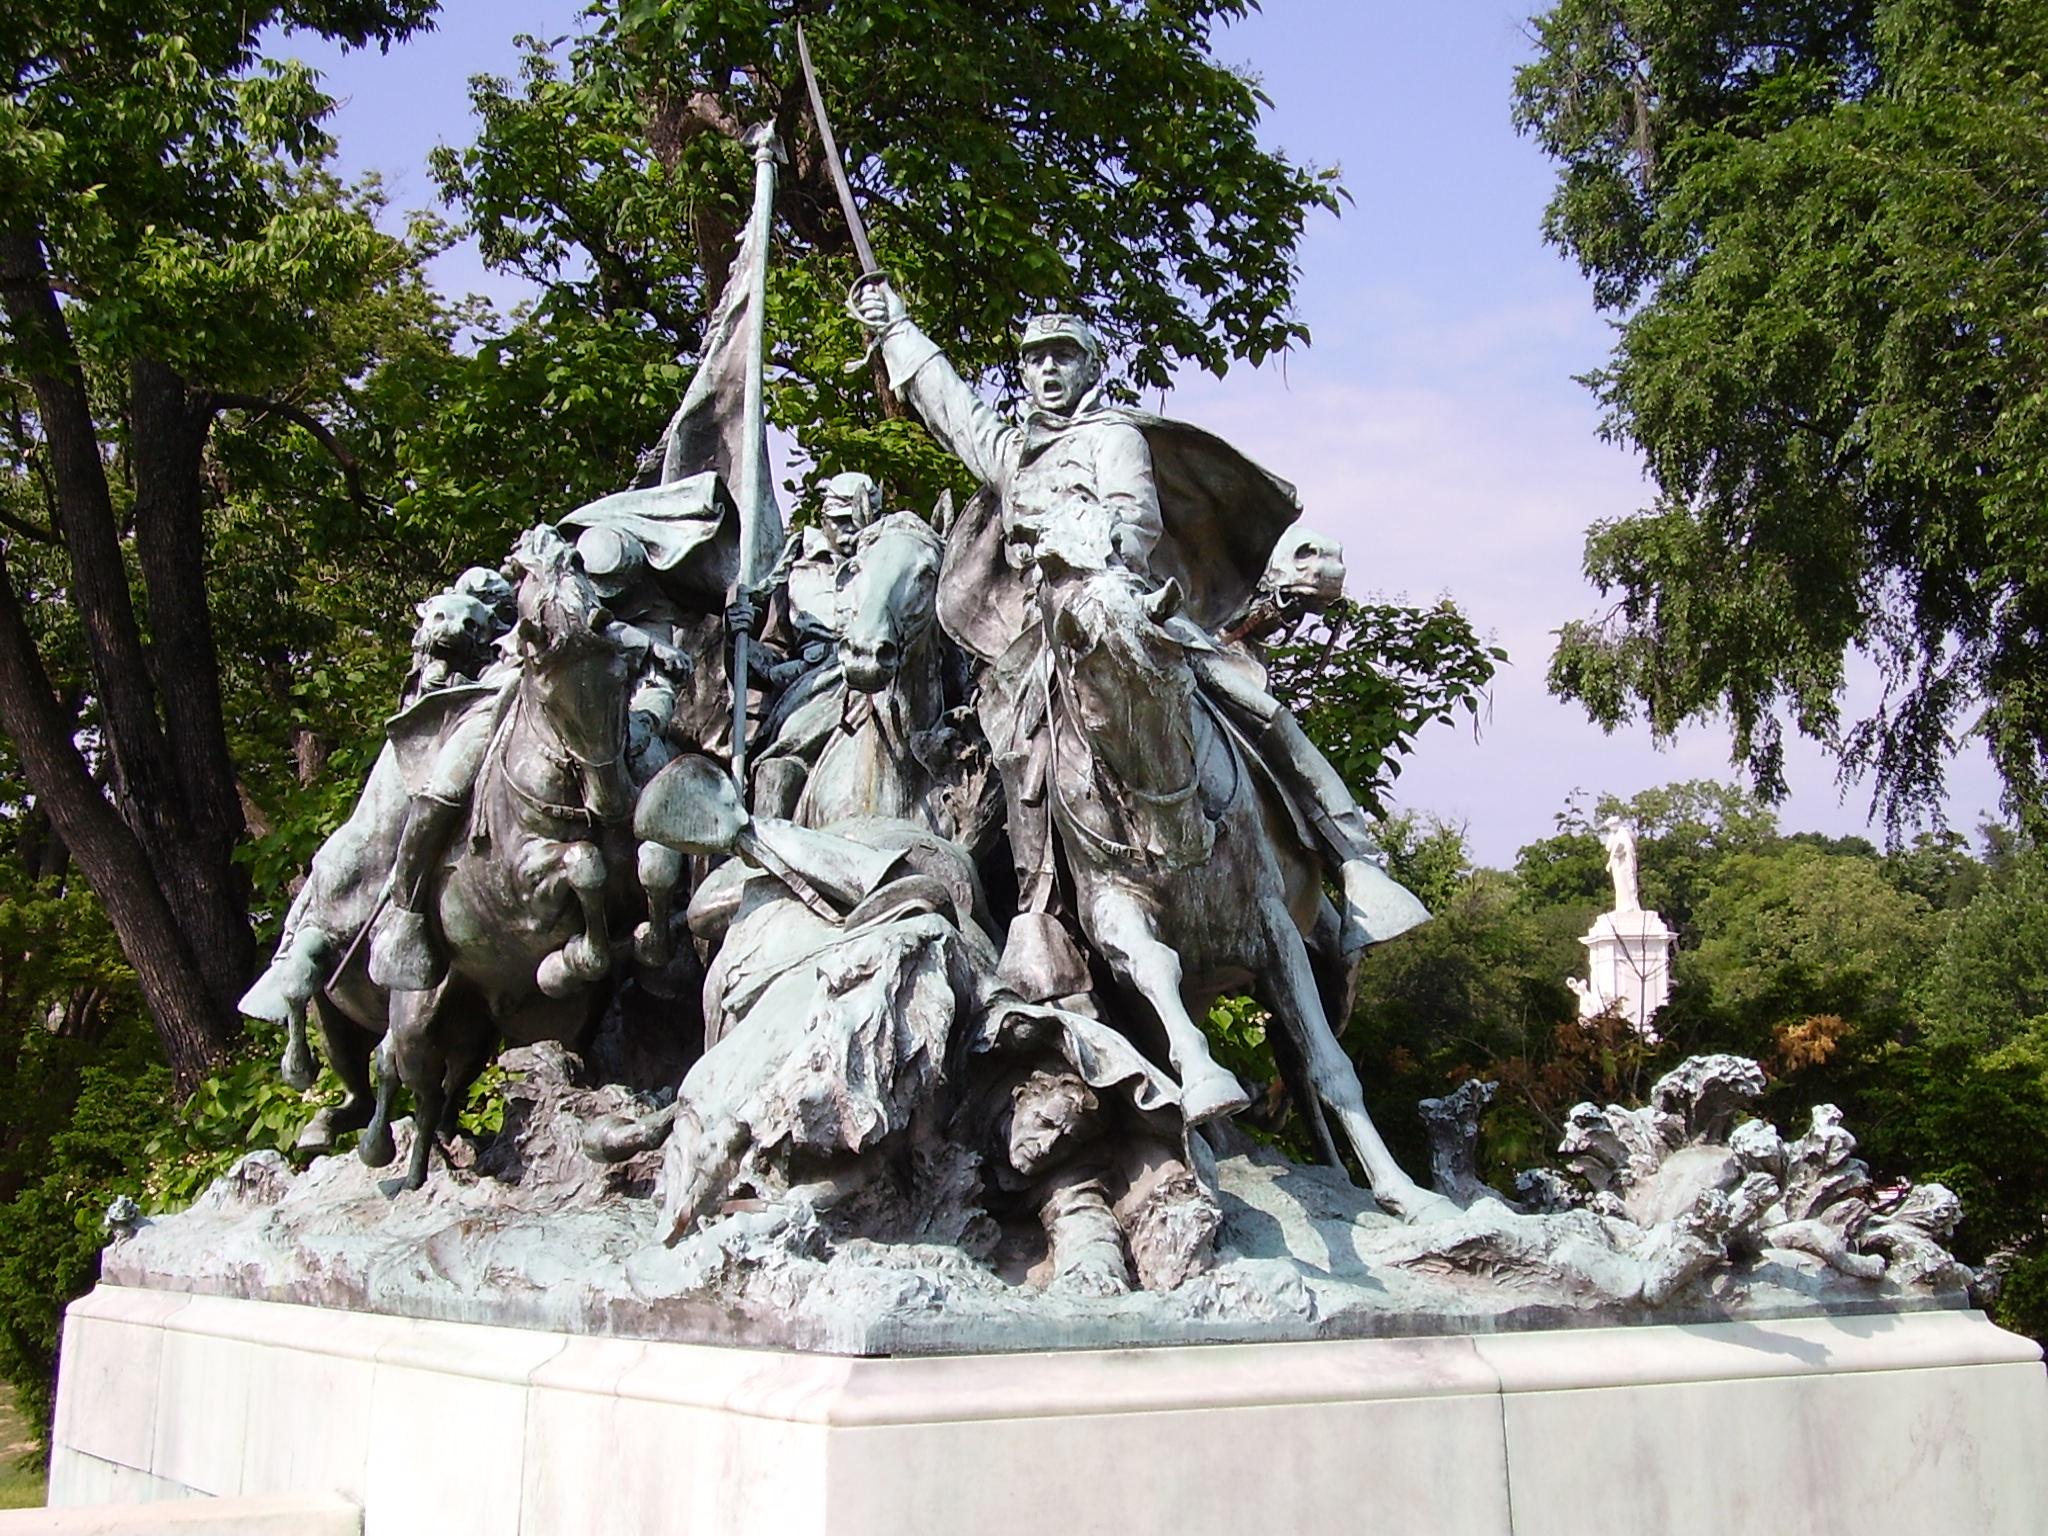 File:Ulysses-Grant-Memorial-Cavalry-Group.jpg - Wikimedia Commons